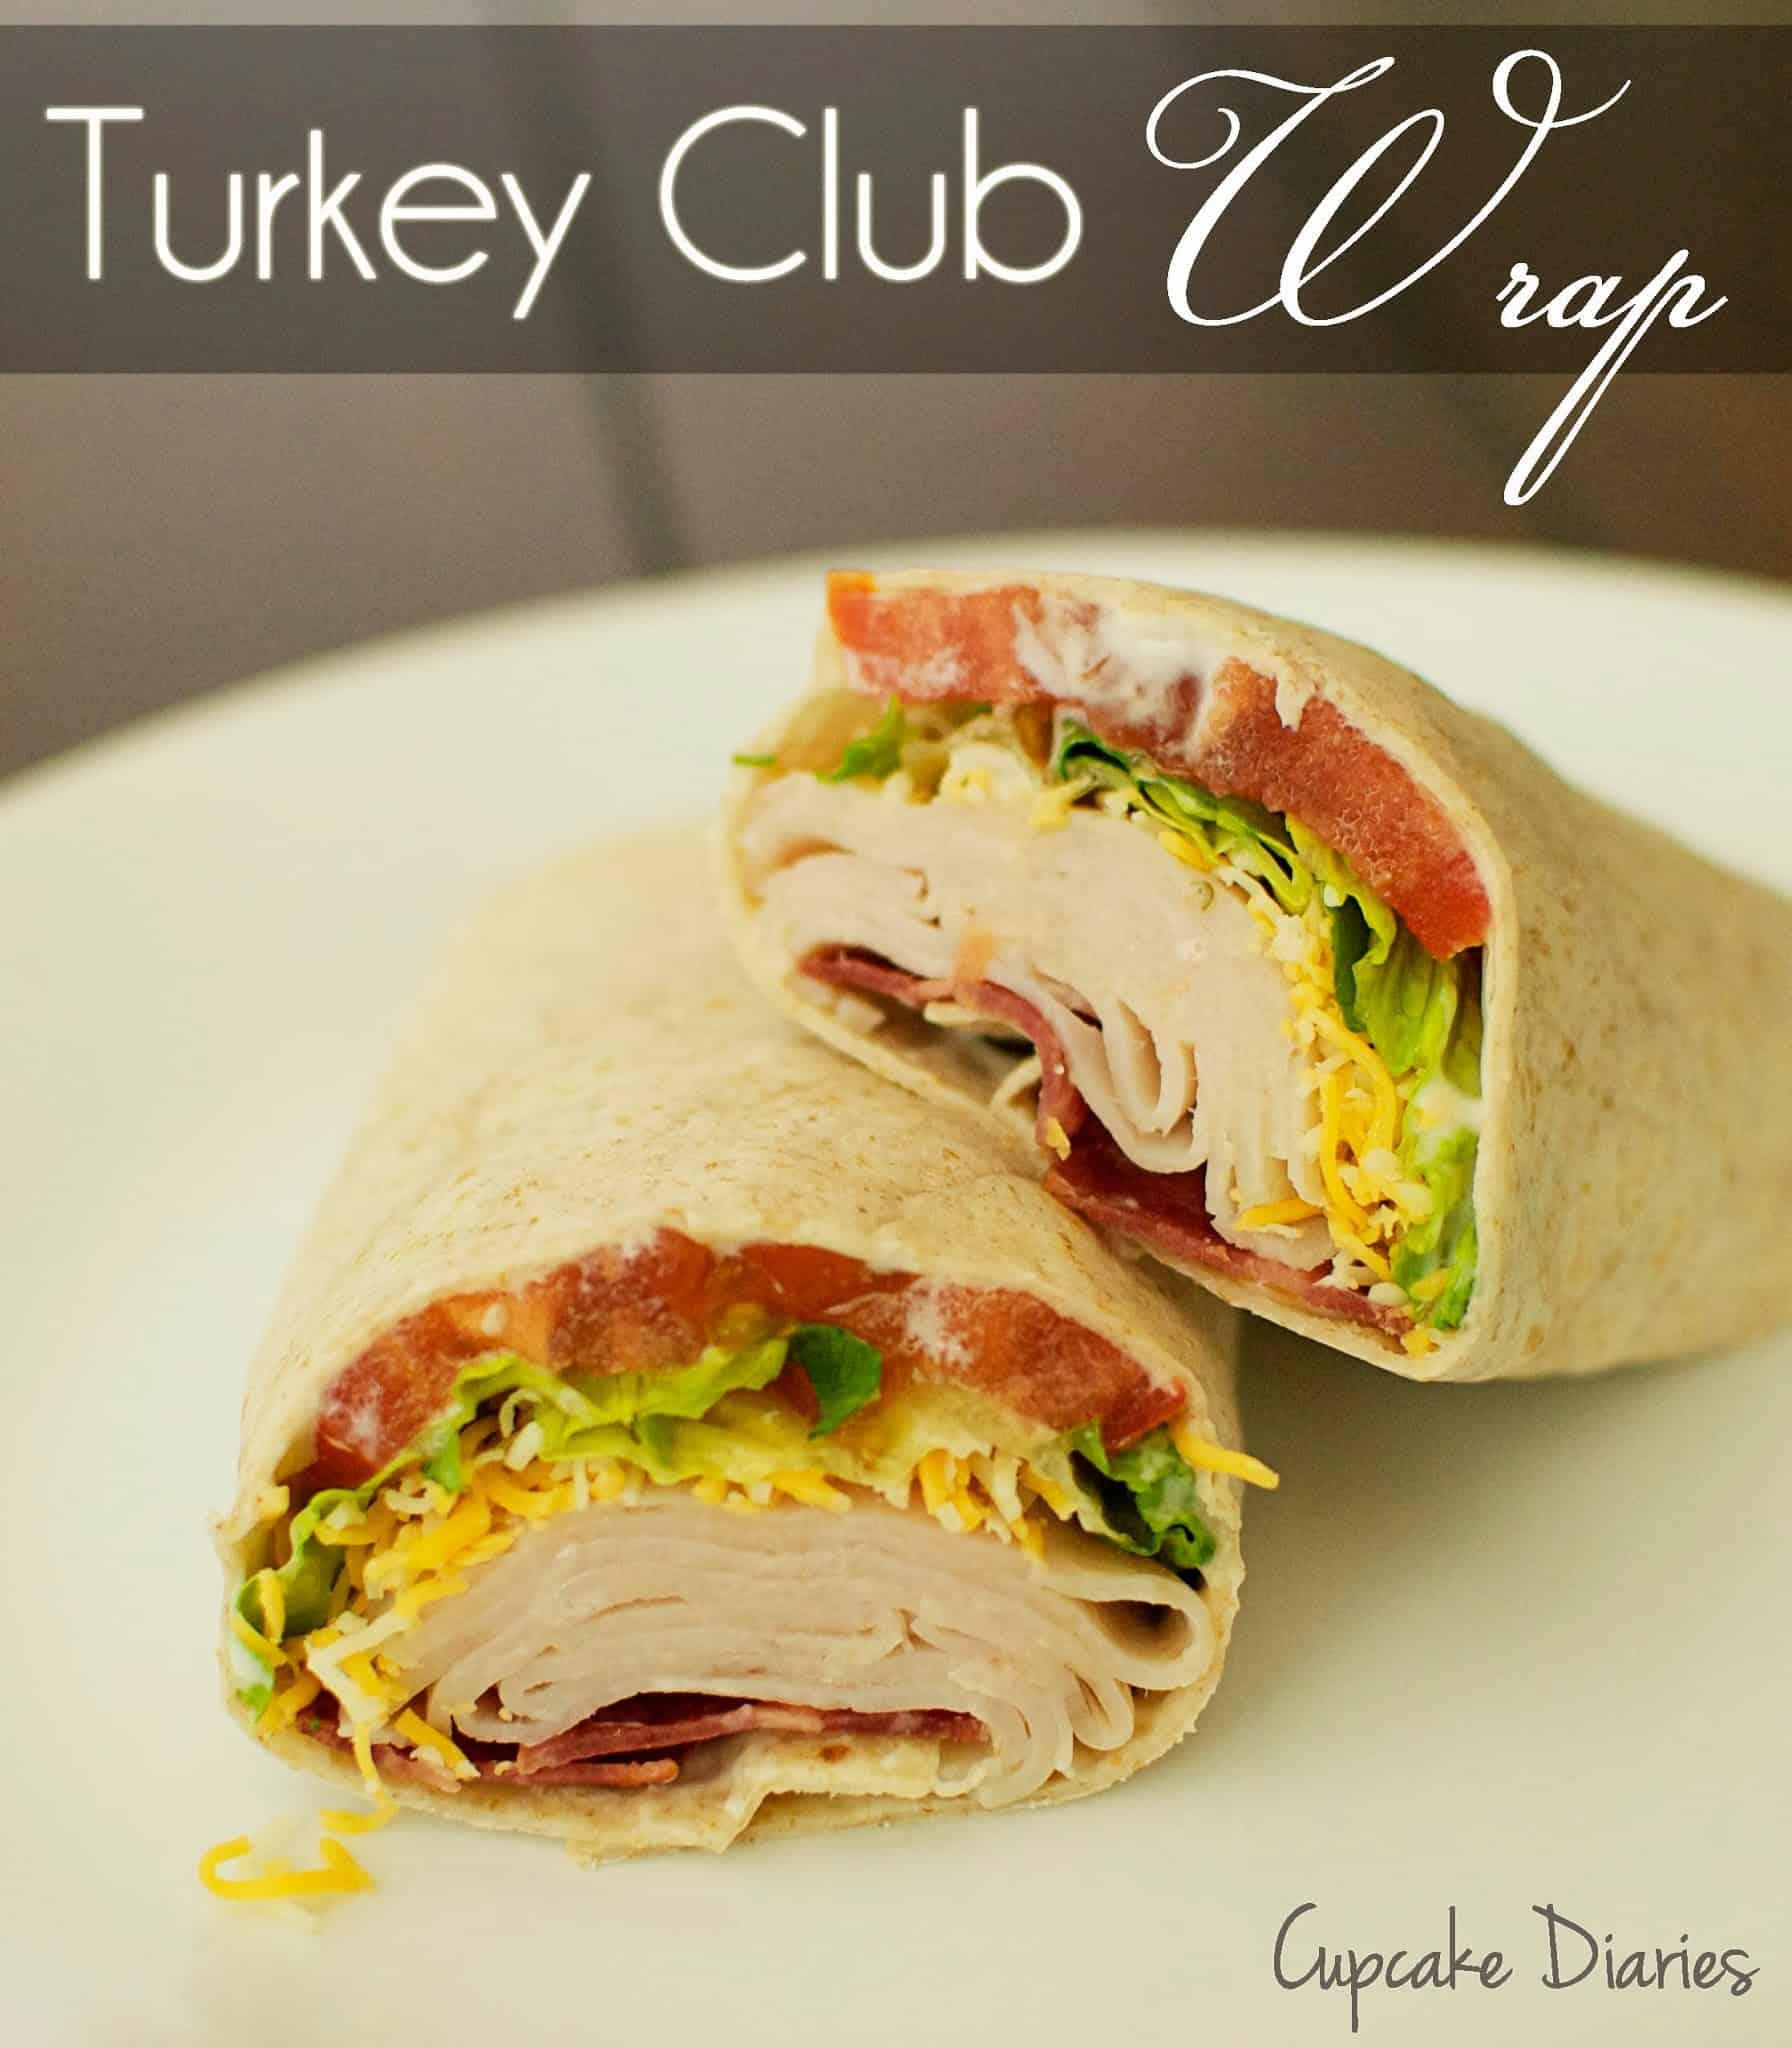 Turkey Club Wrap Cupcake Diaries